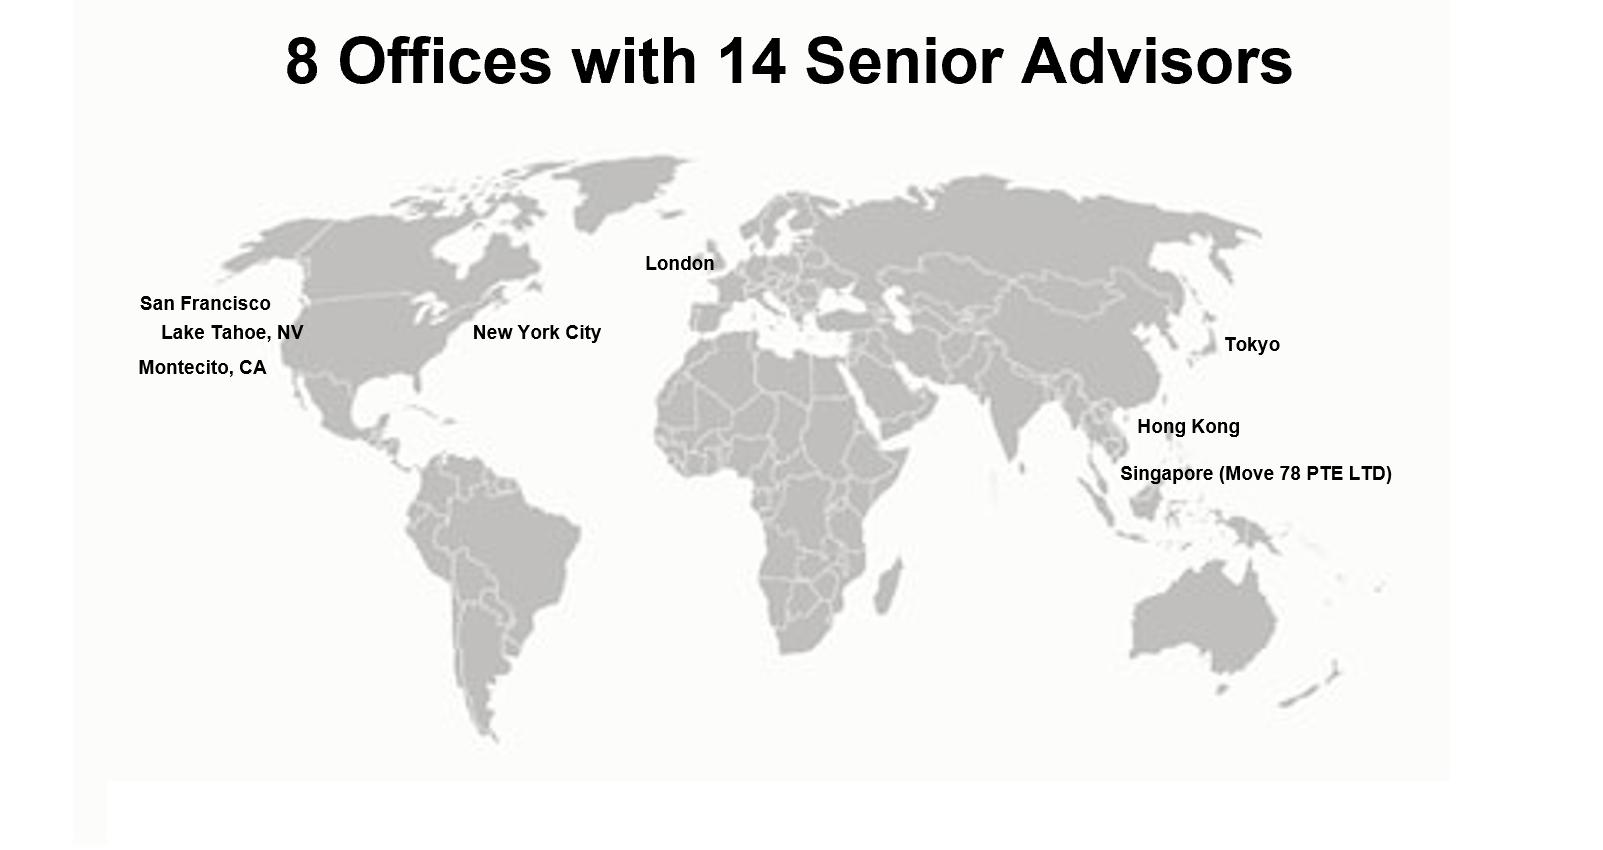 SoHo Advisor Map 05-06-19.PNG